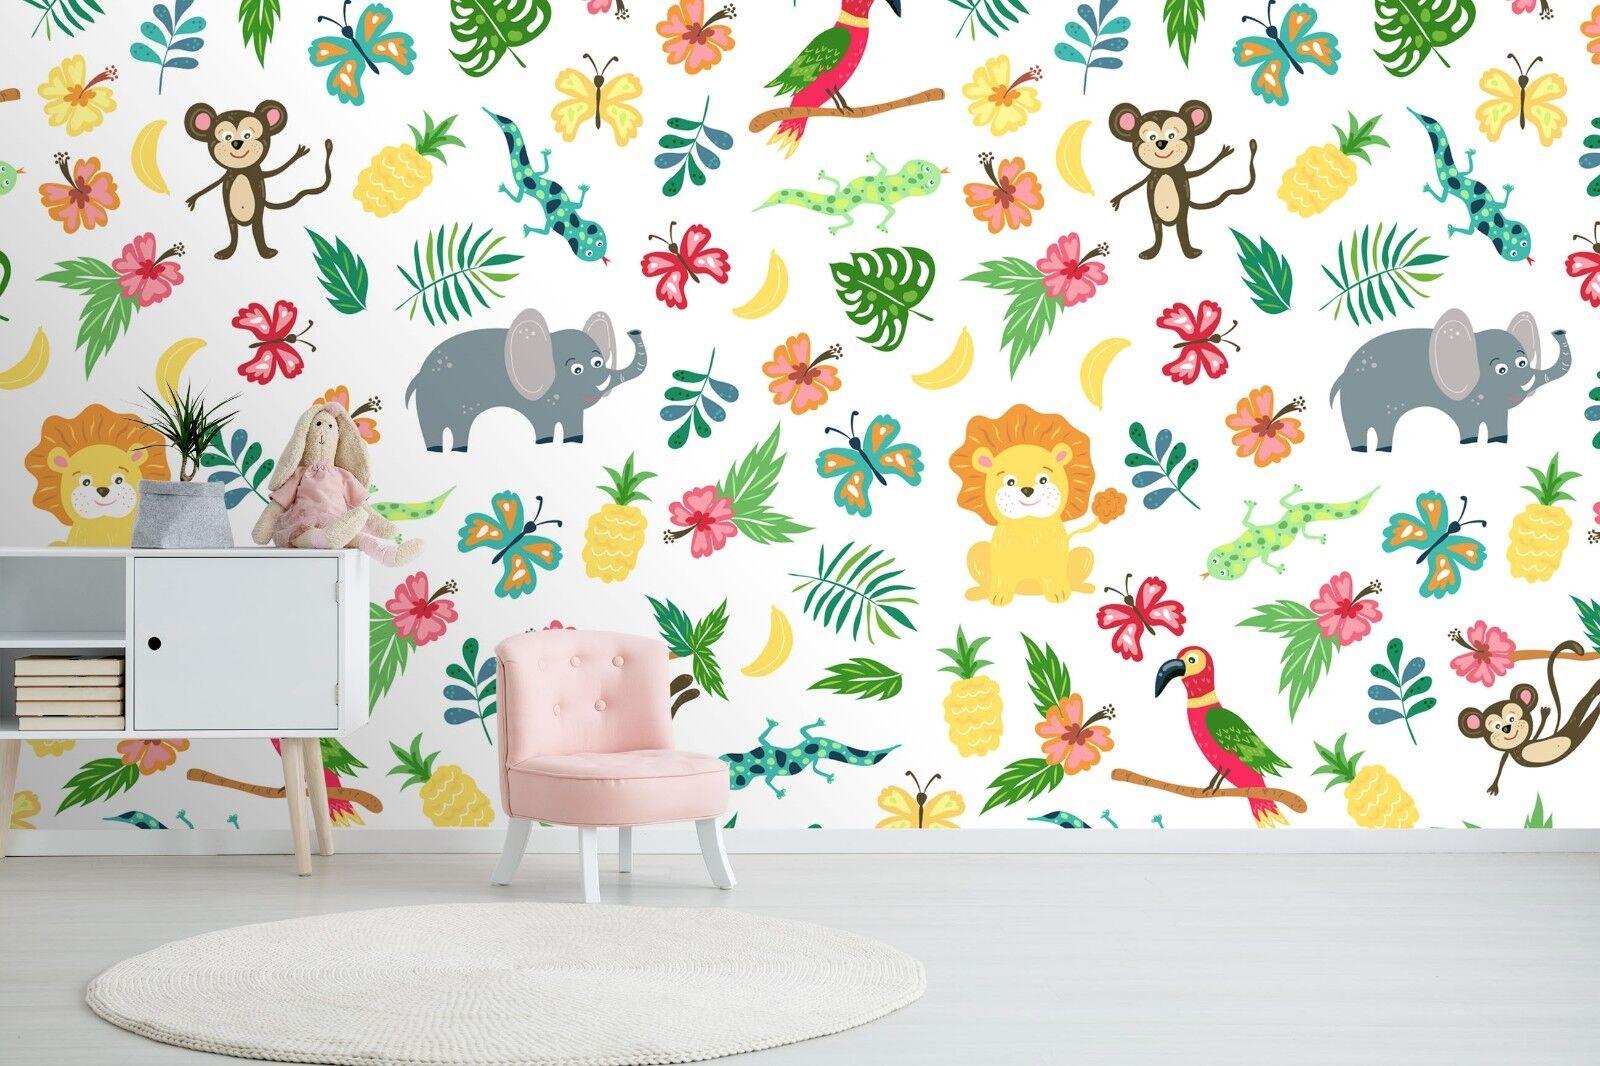 3D Farbe Animals World 42 Wallpaper Murals Wall Print Wallpaper Mural AJ WALL UK